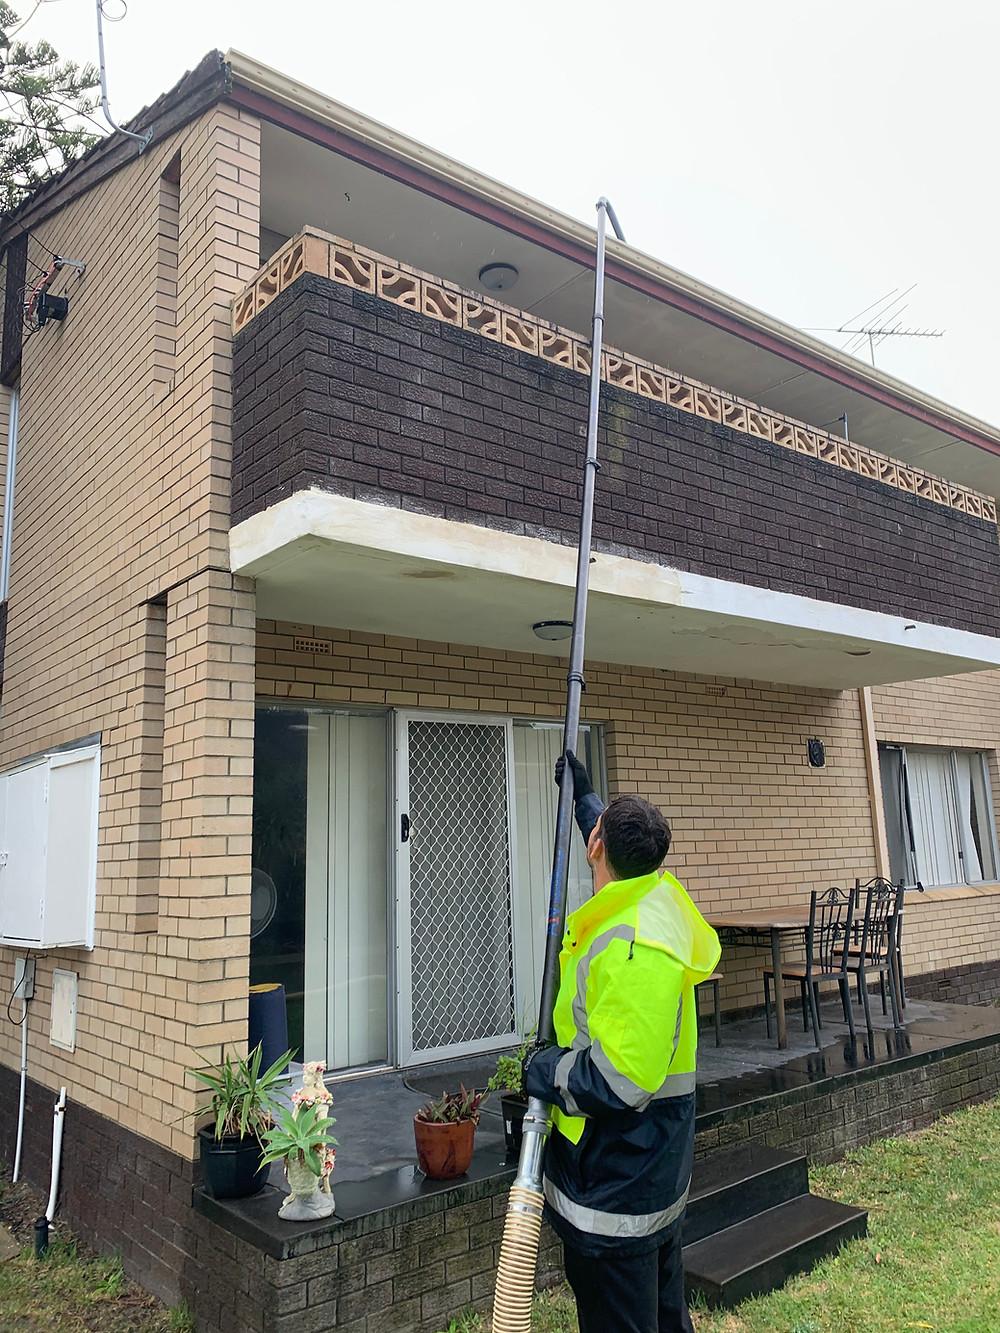 Gutter vacuuming perth, gutter vacuum perth, gutter cleaning perth, gutter vacuum service perth, cleaning gutters in perth western australia, gutter vacuum, gutter vacuuming, blocked gutters perth